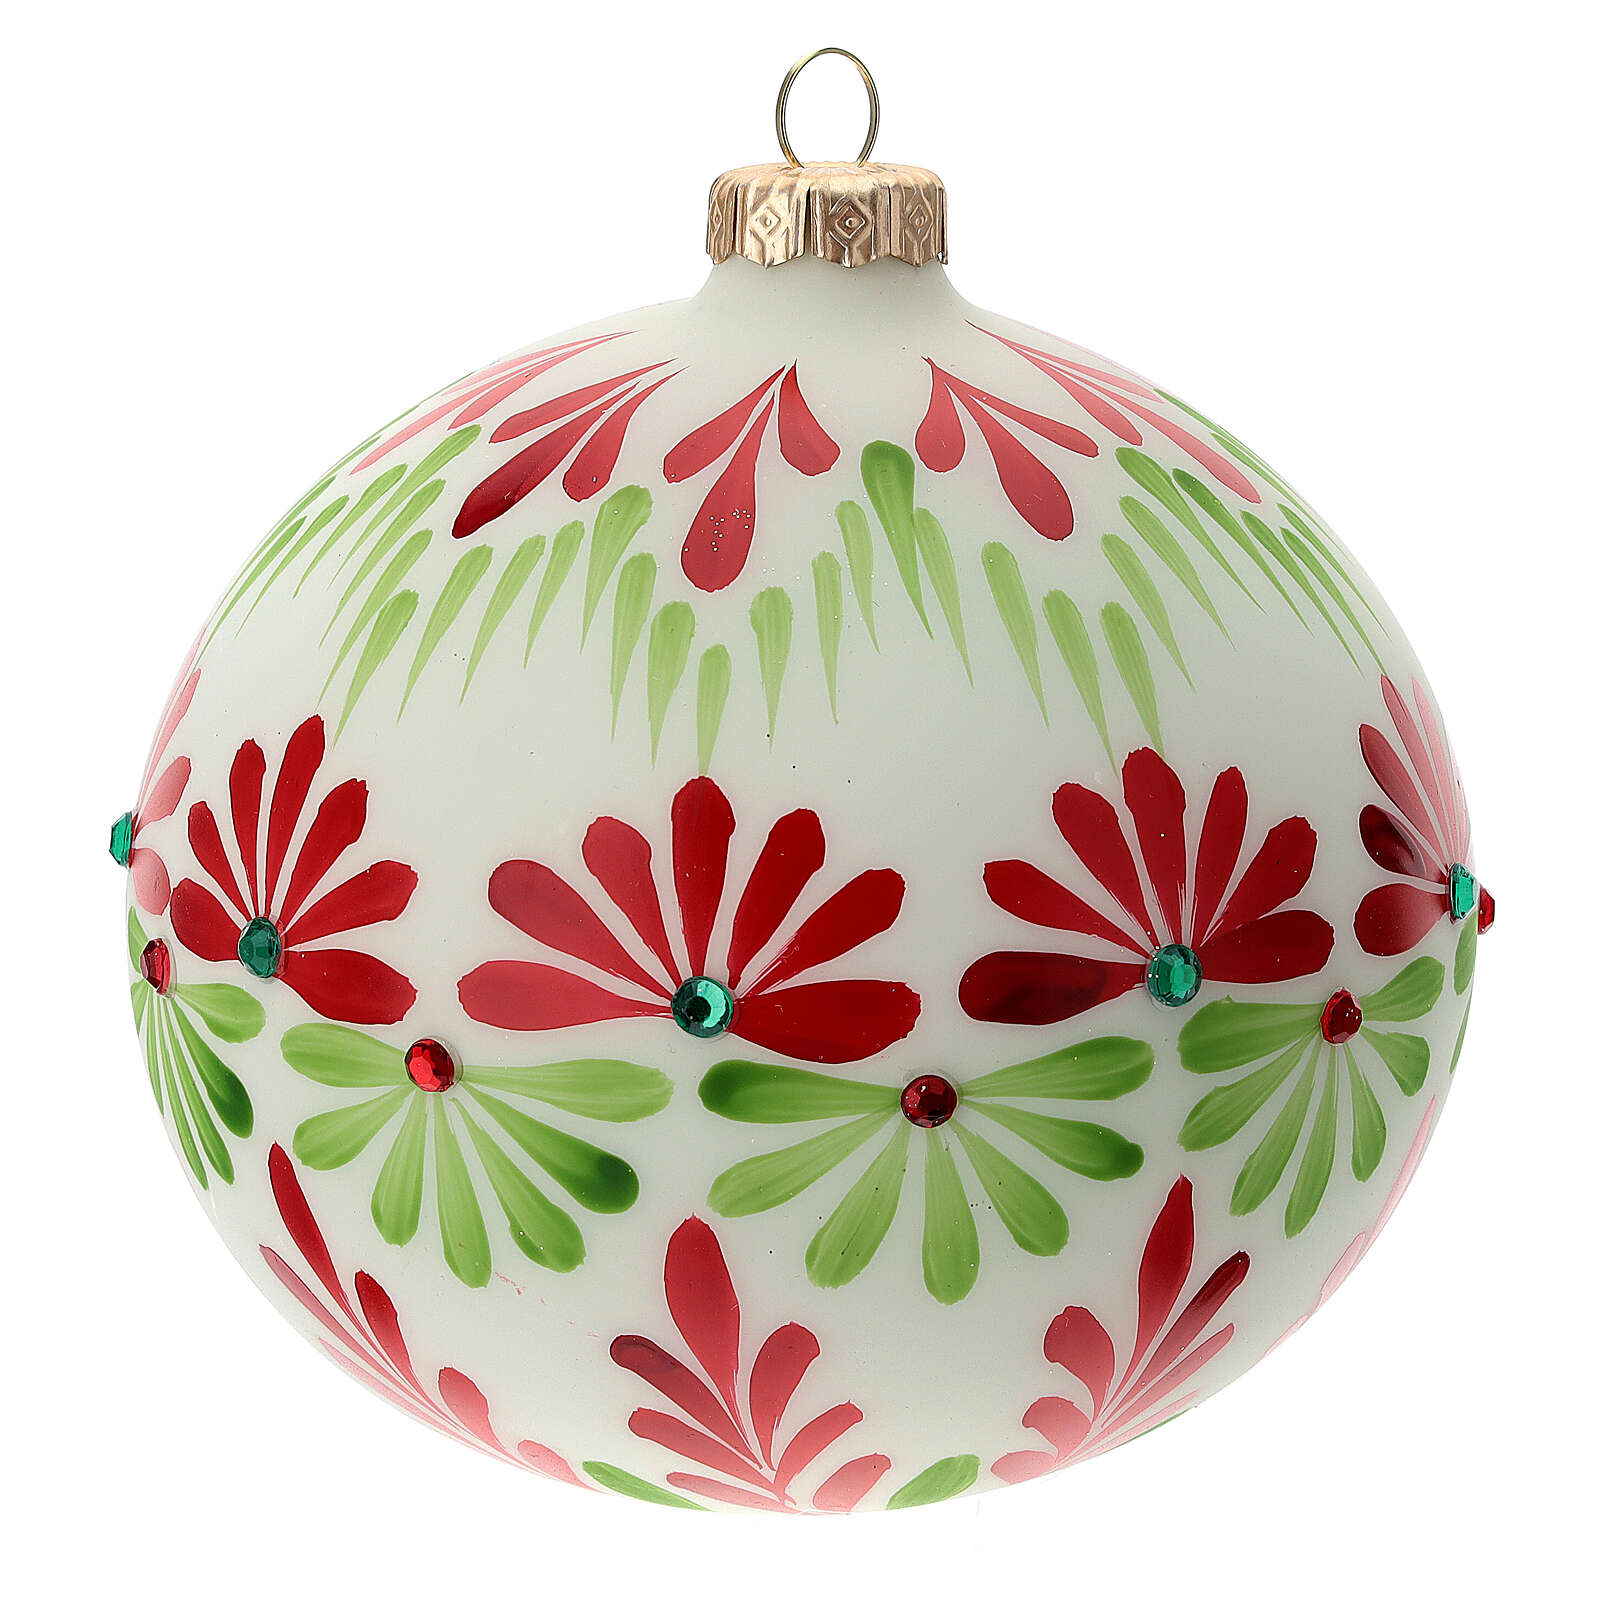 Bola árvore de Natal pedras e flores coloridos vidro soprado 120 mm 4